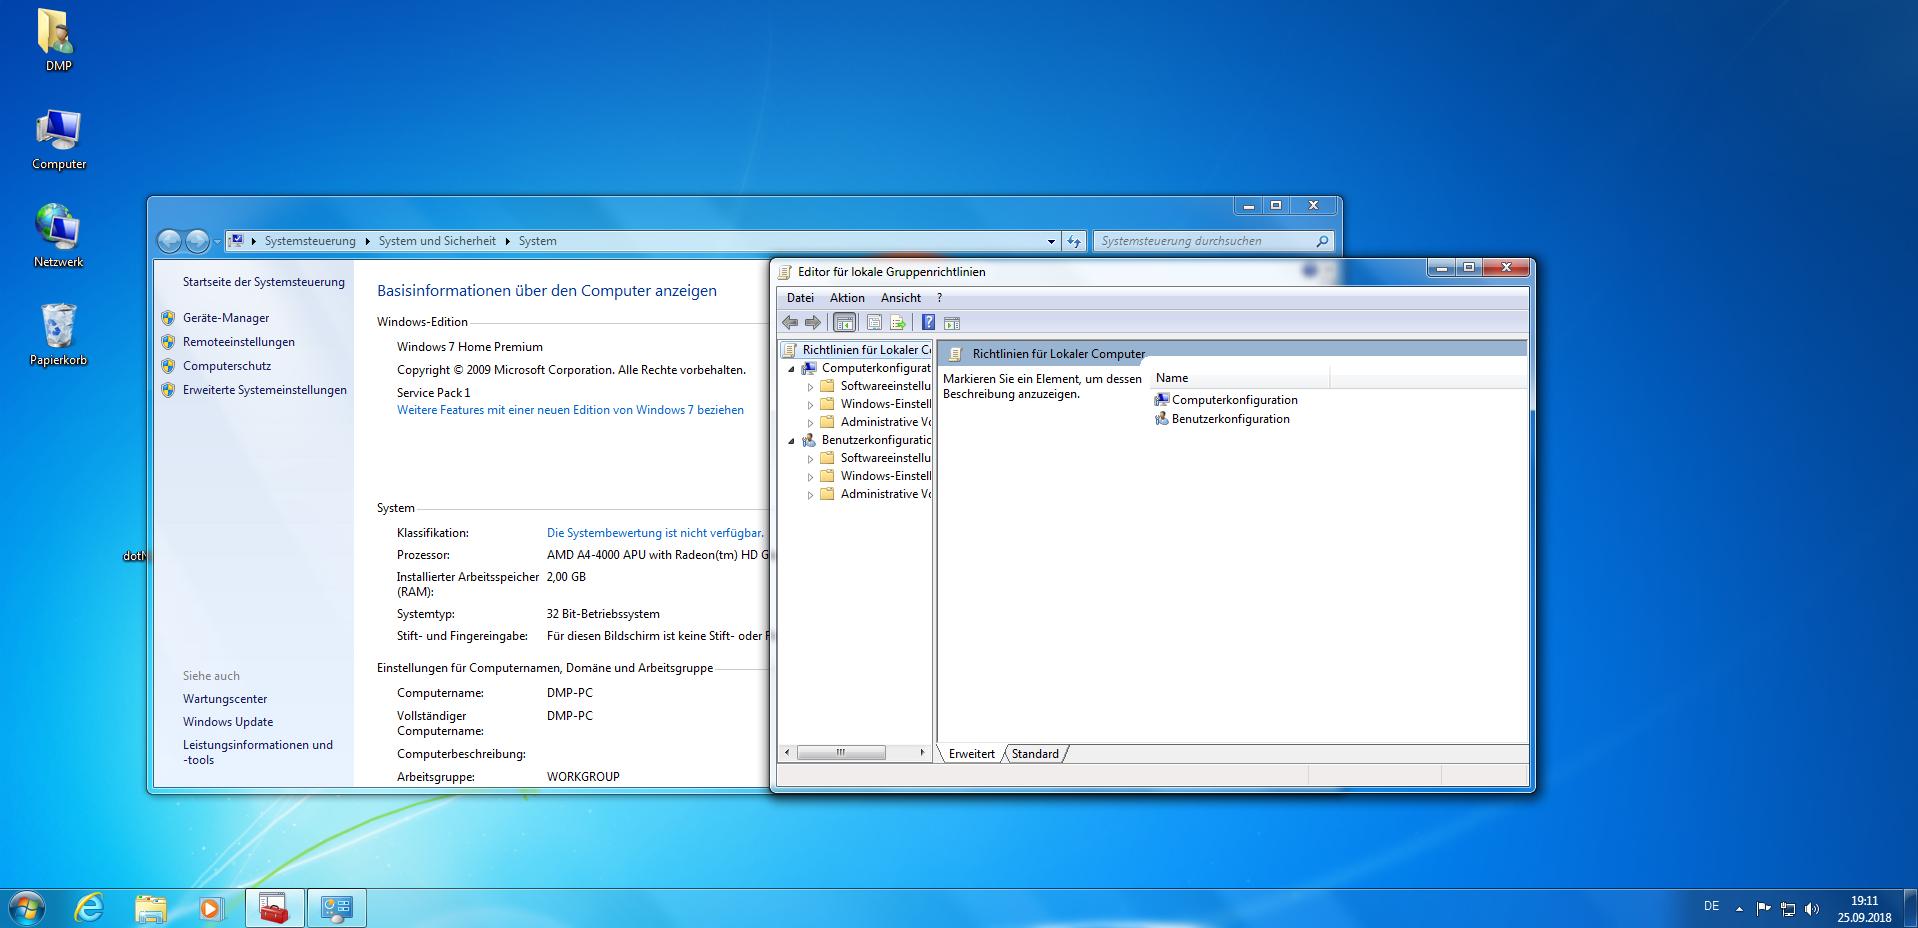 [Bild: Windows+7+HP-2018-09-25-19-11-47.png]